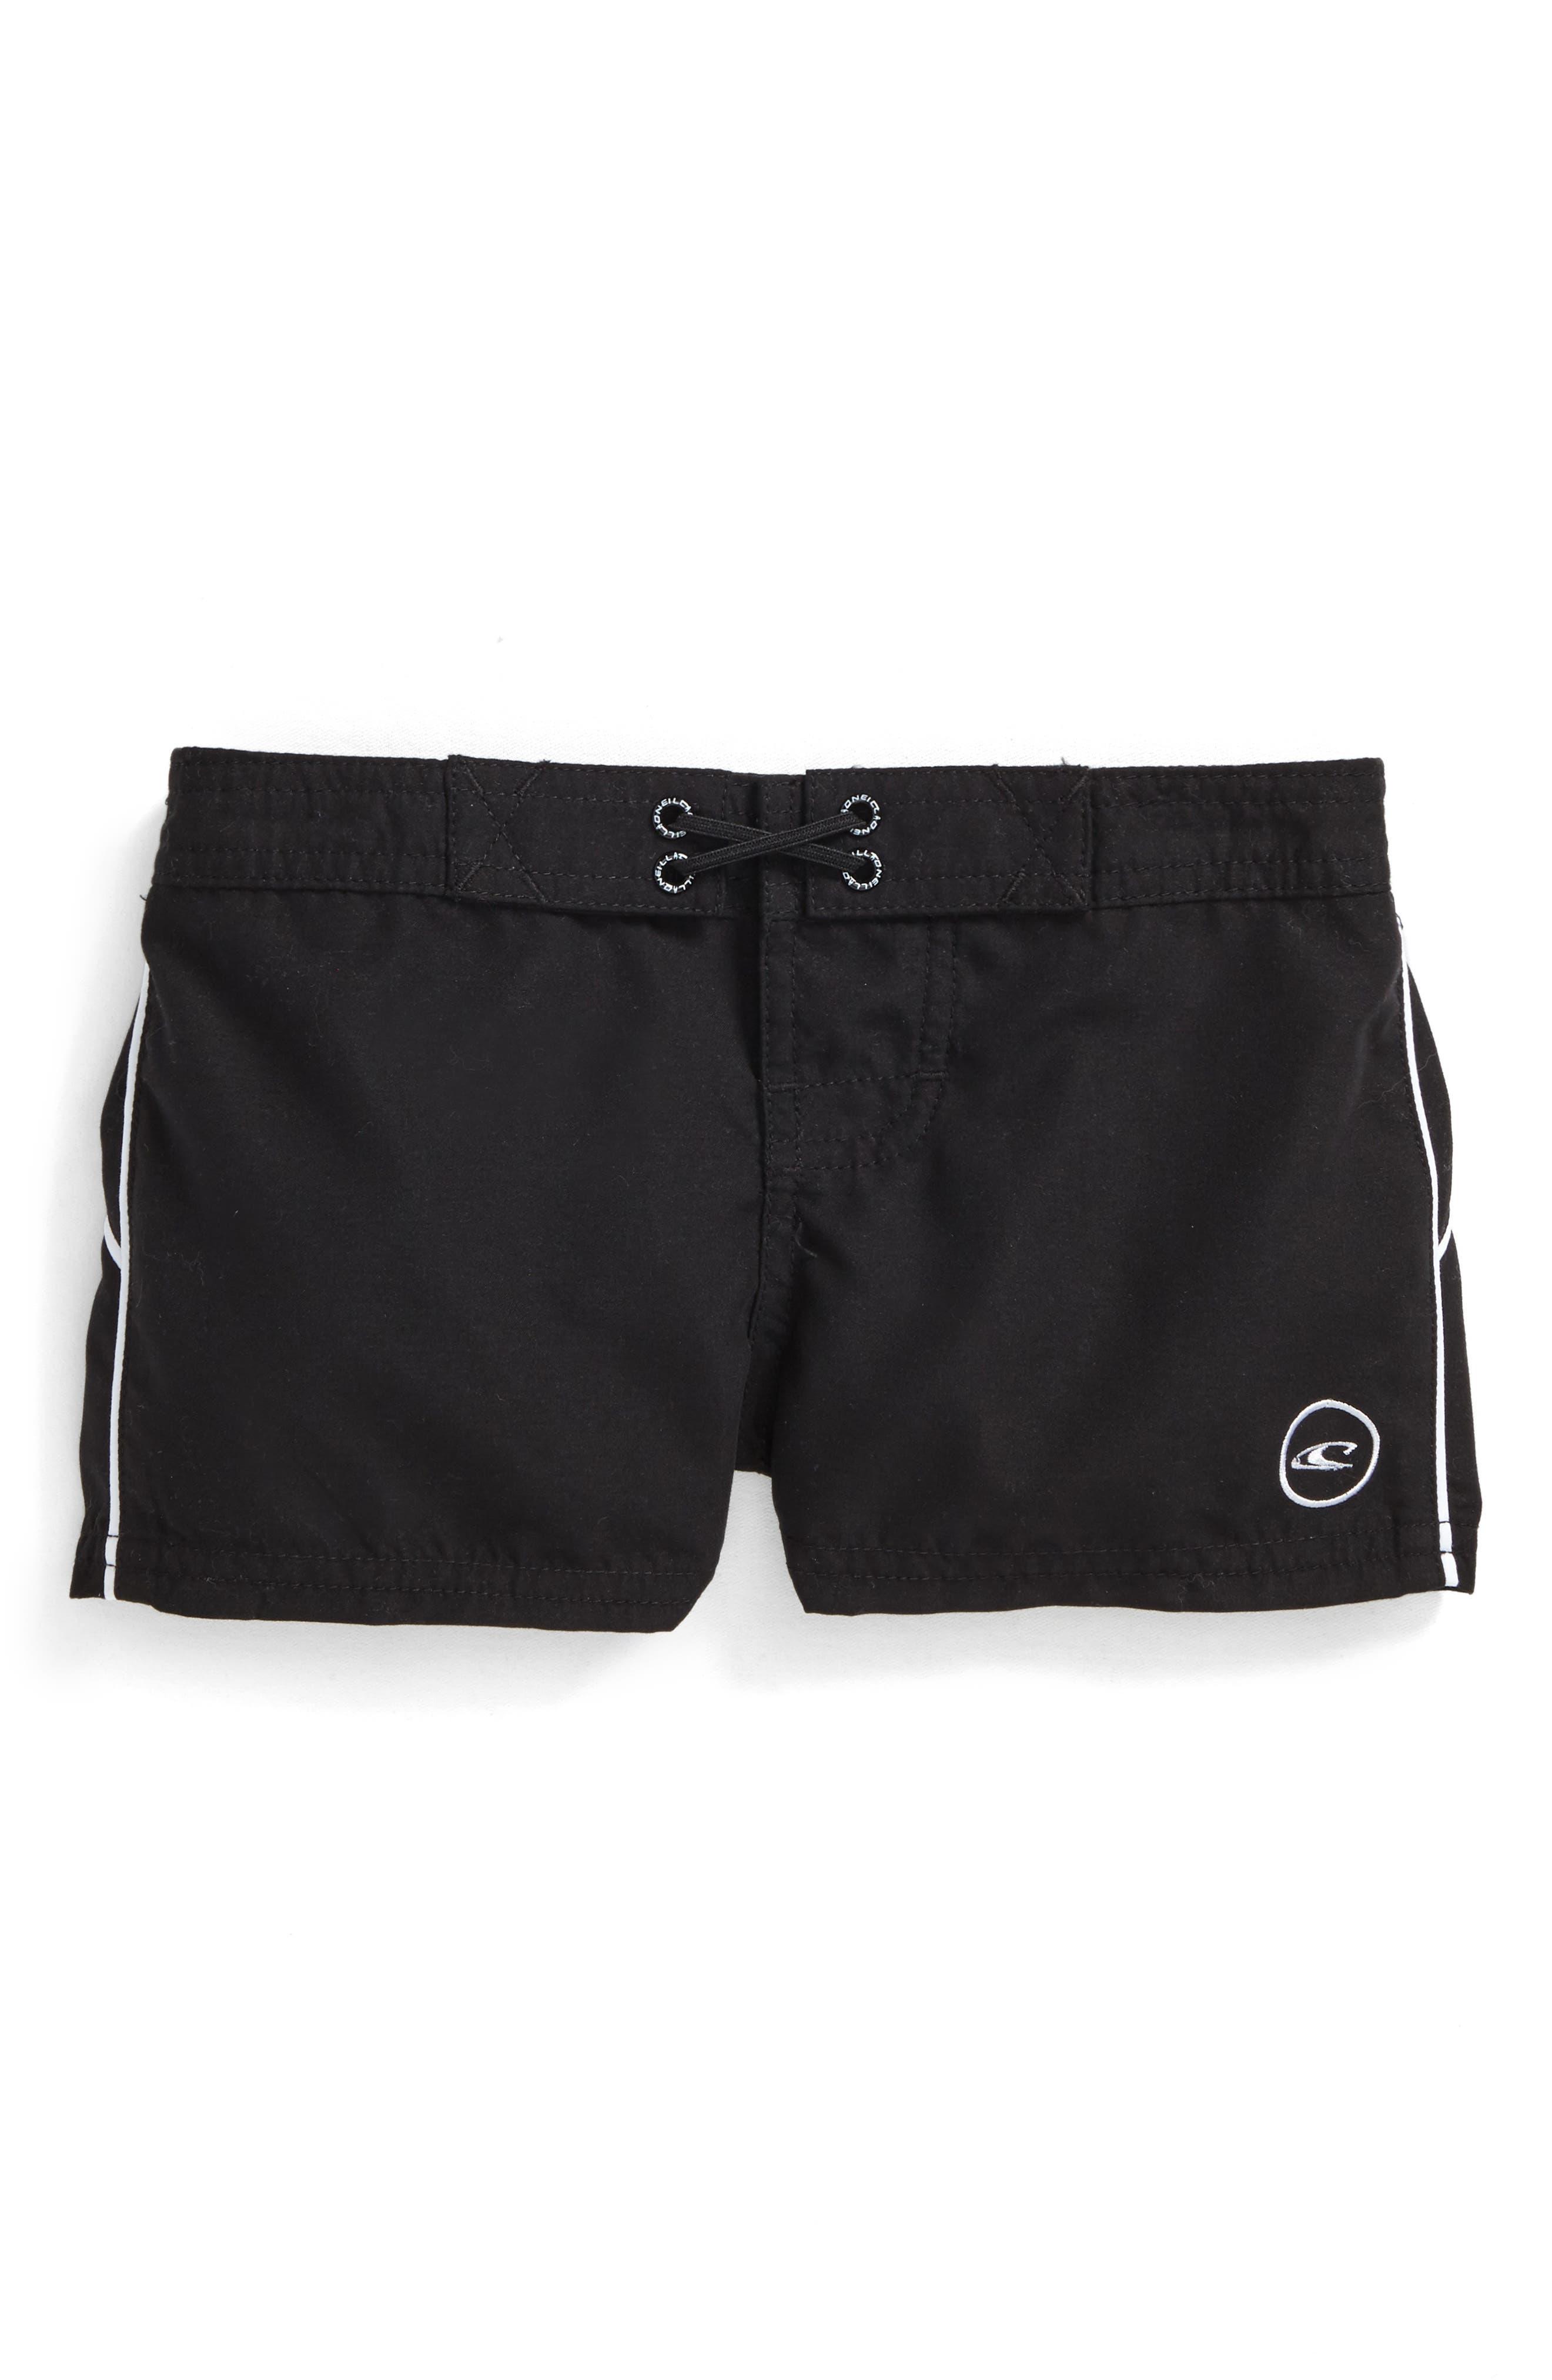 Salt Water Board Shorts,                         Main,                         color, Black - Blk